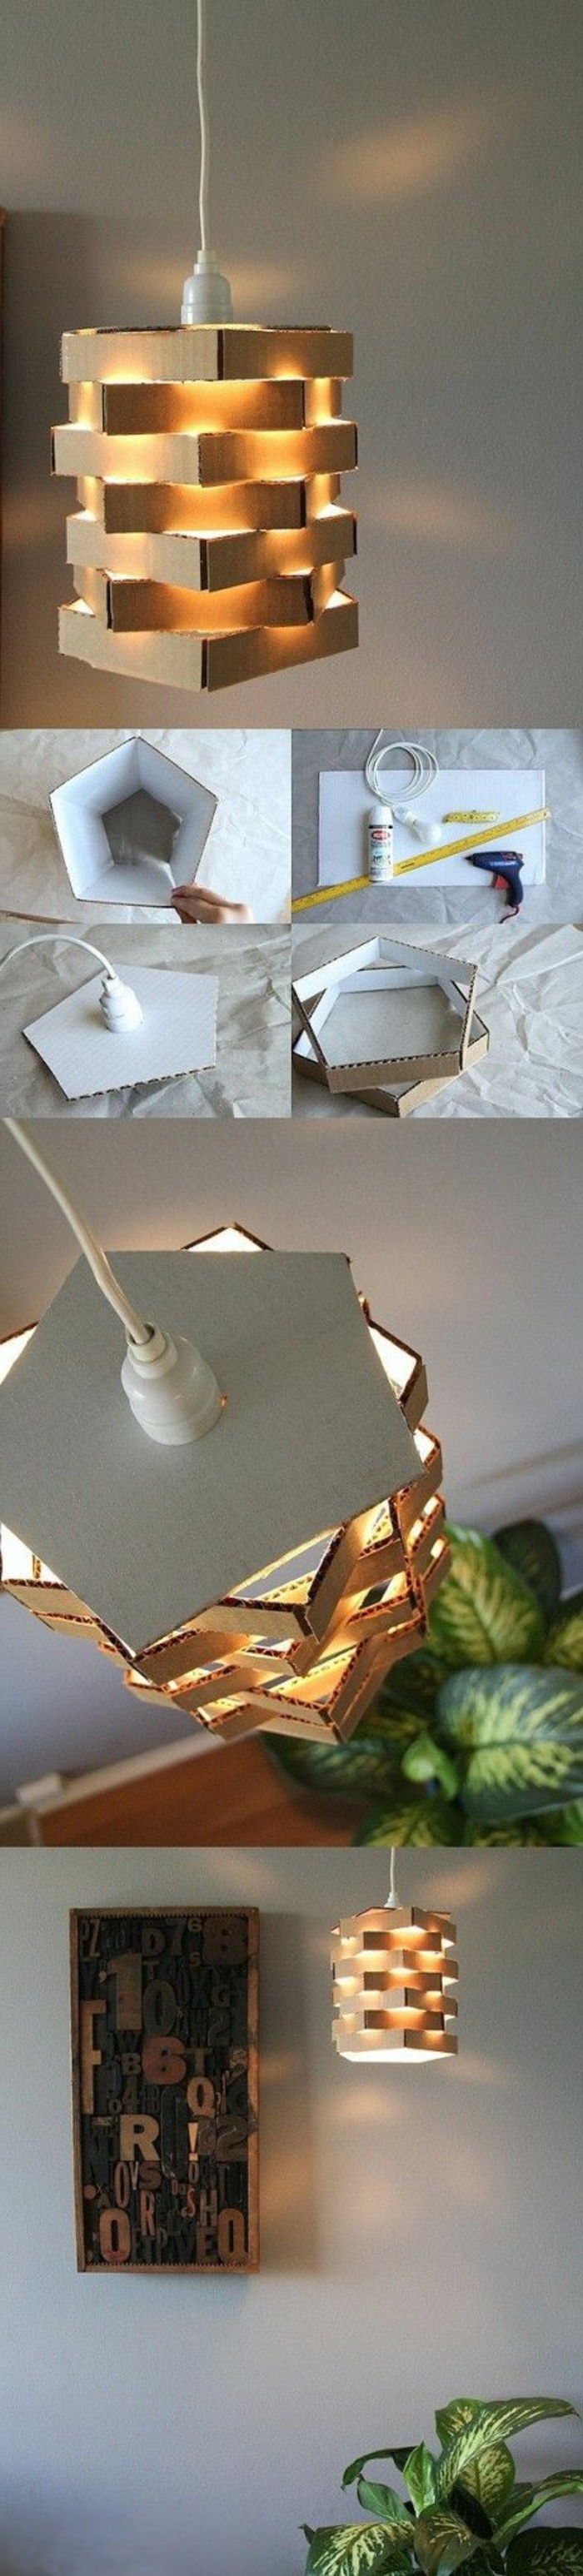 Lampenschirm selber machen: DIY Lampenschirm aus Karton, Umzugskarton, unregelmäßige Form